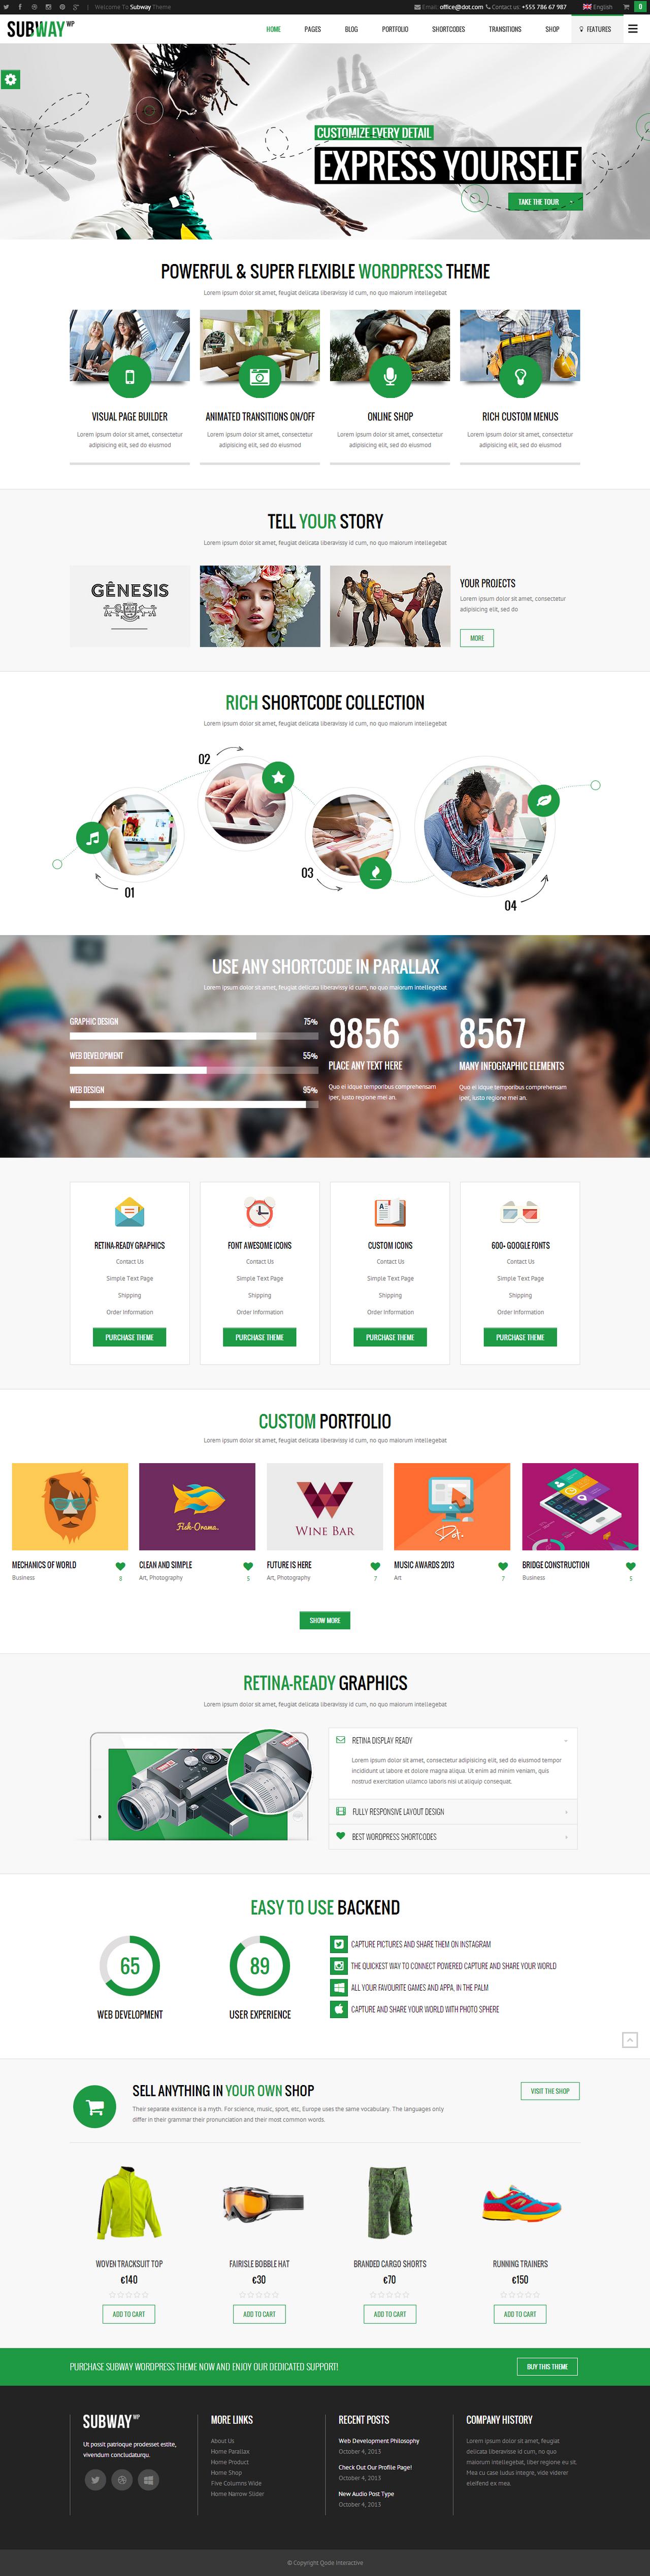 Subway WordPress Theme by webdesigngeek